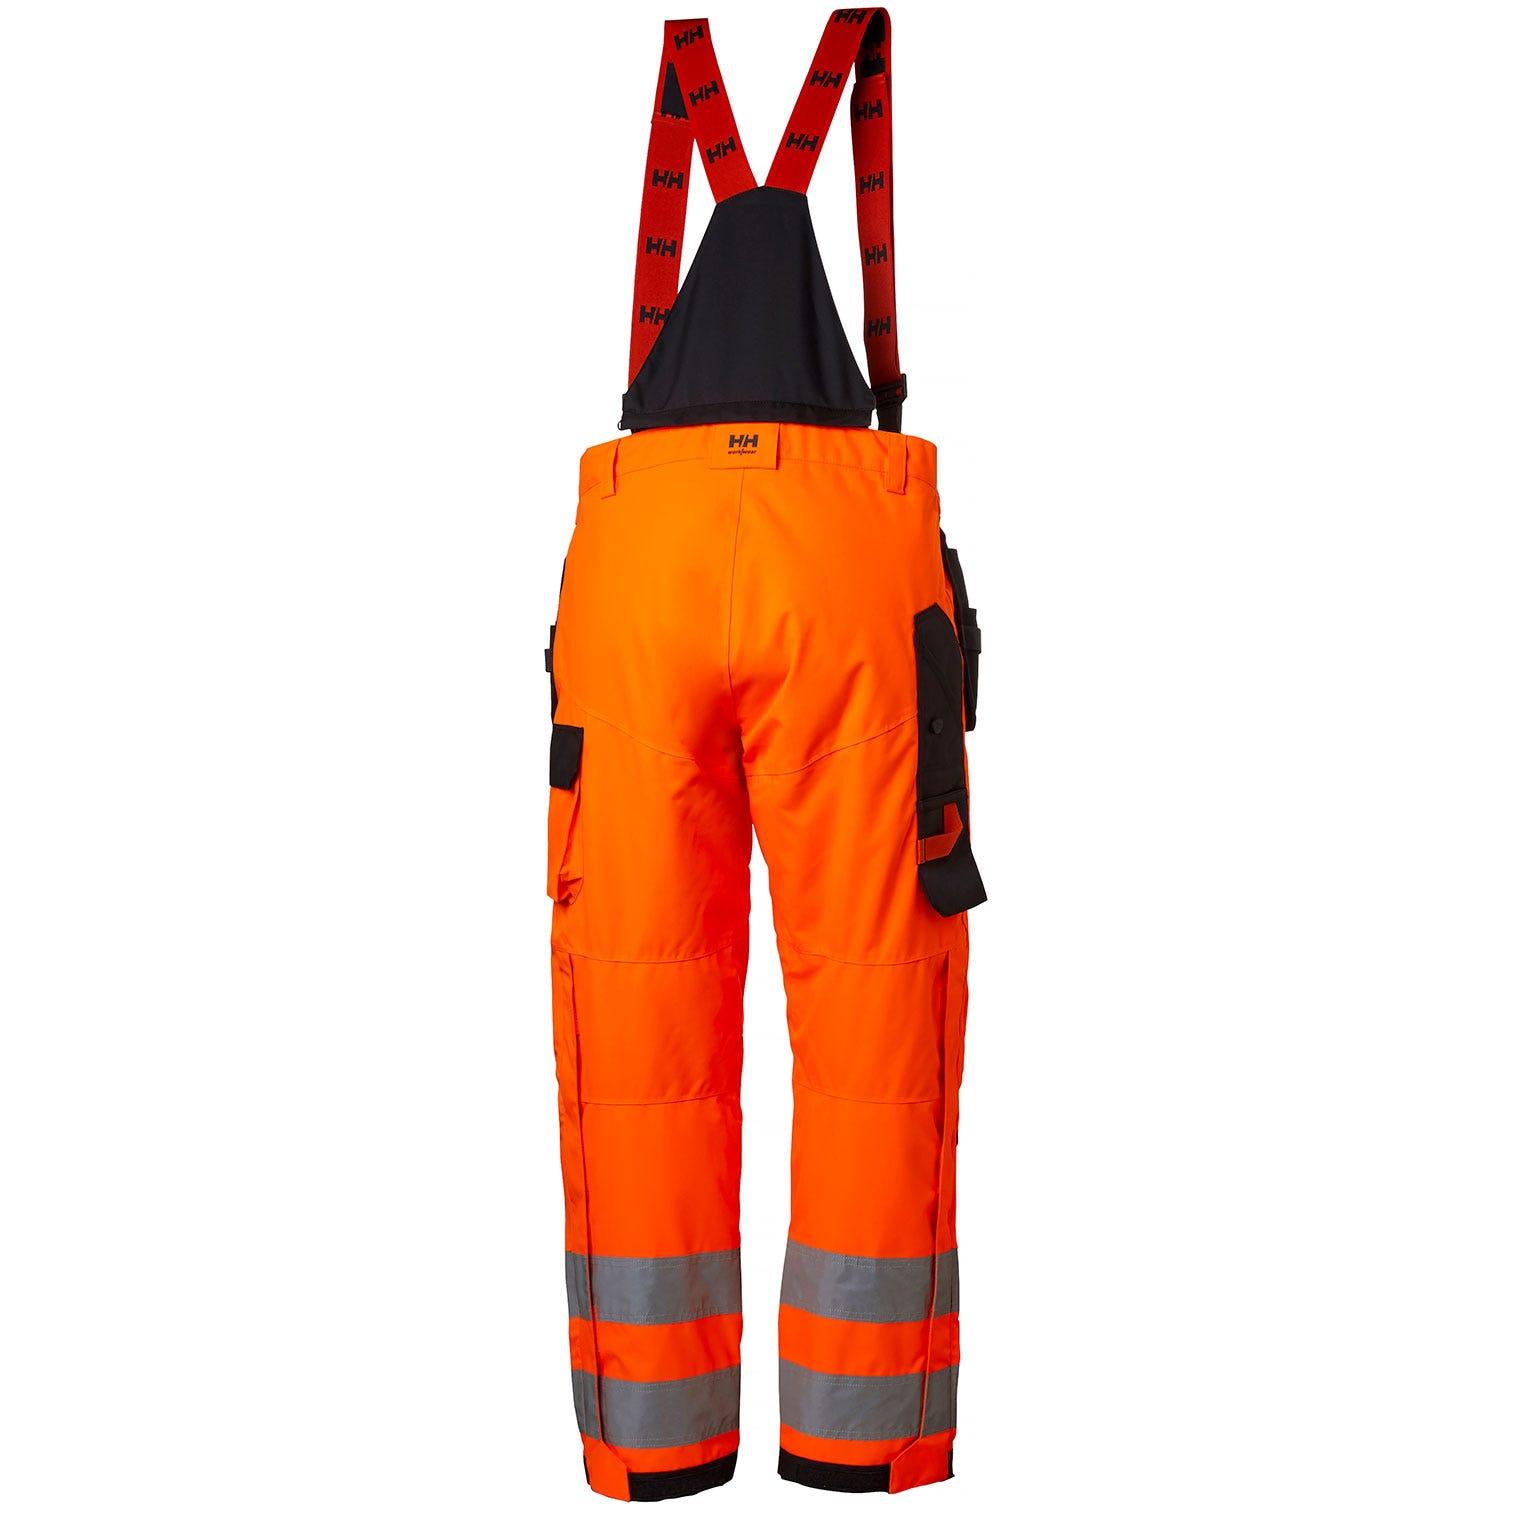 Helly Hansen Winterbroeken Alna 71495 High Vis fluo oranje-ebbenhout(269)